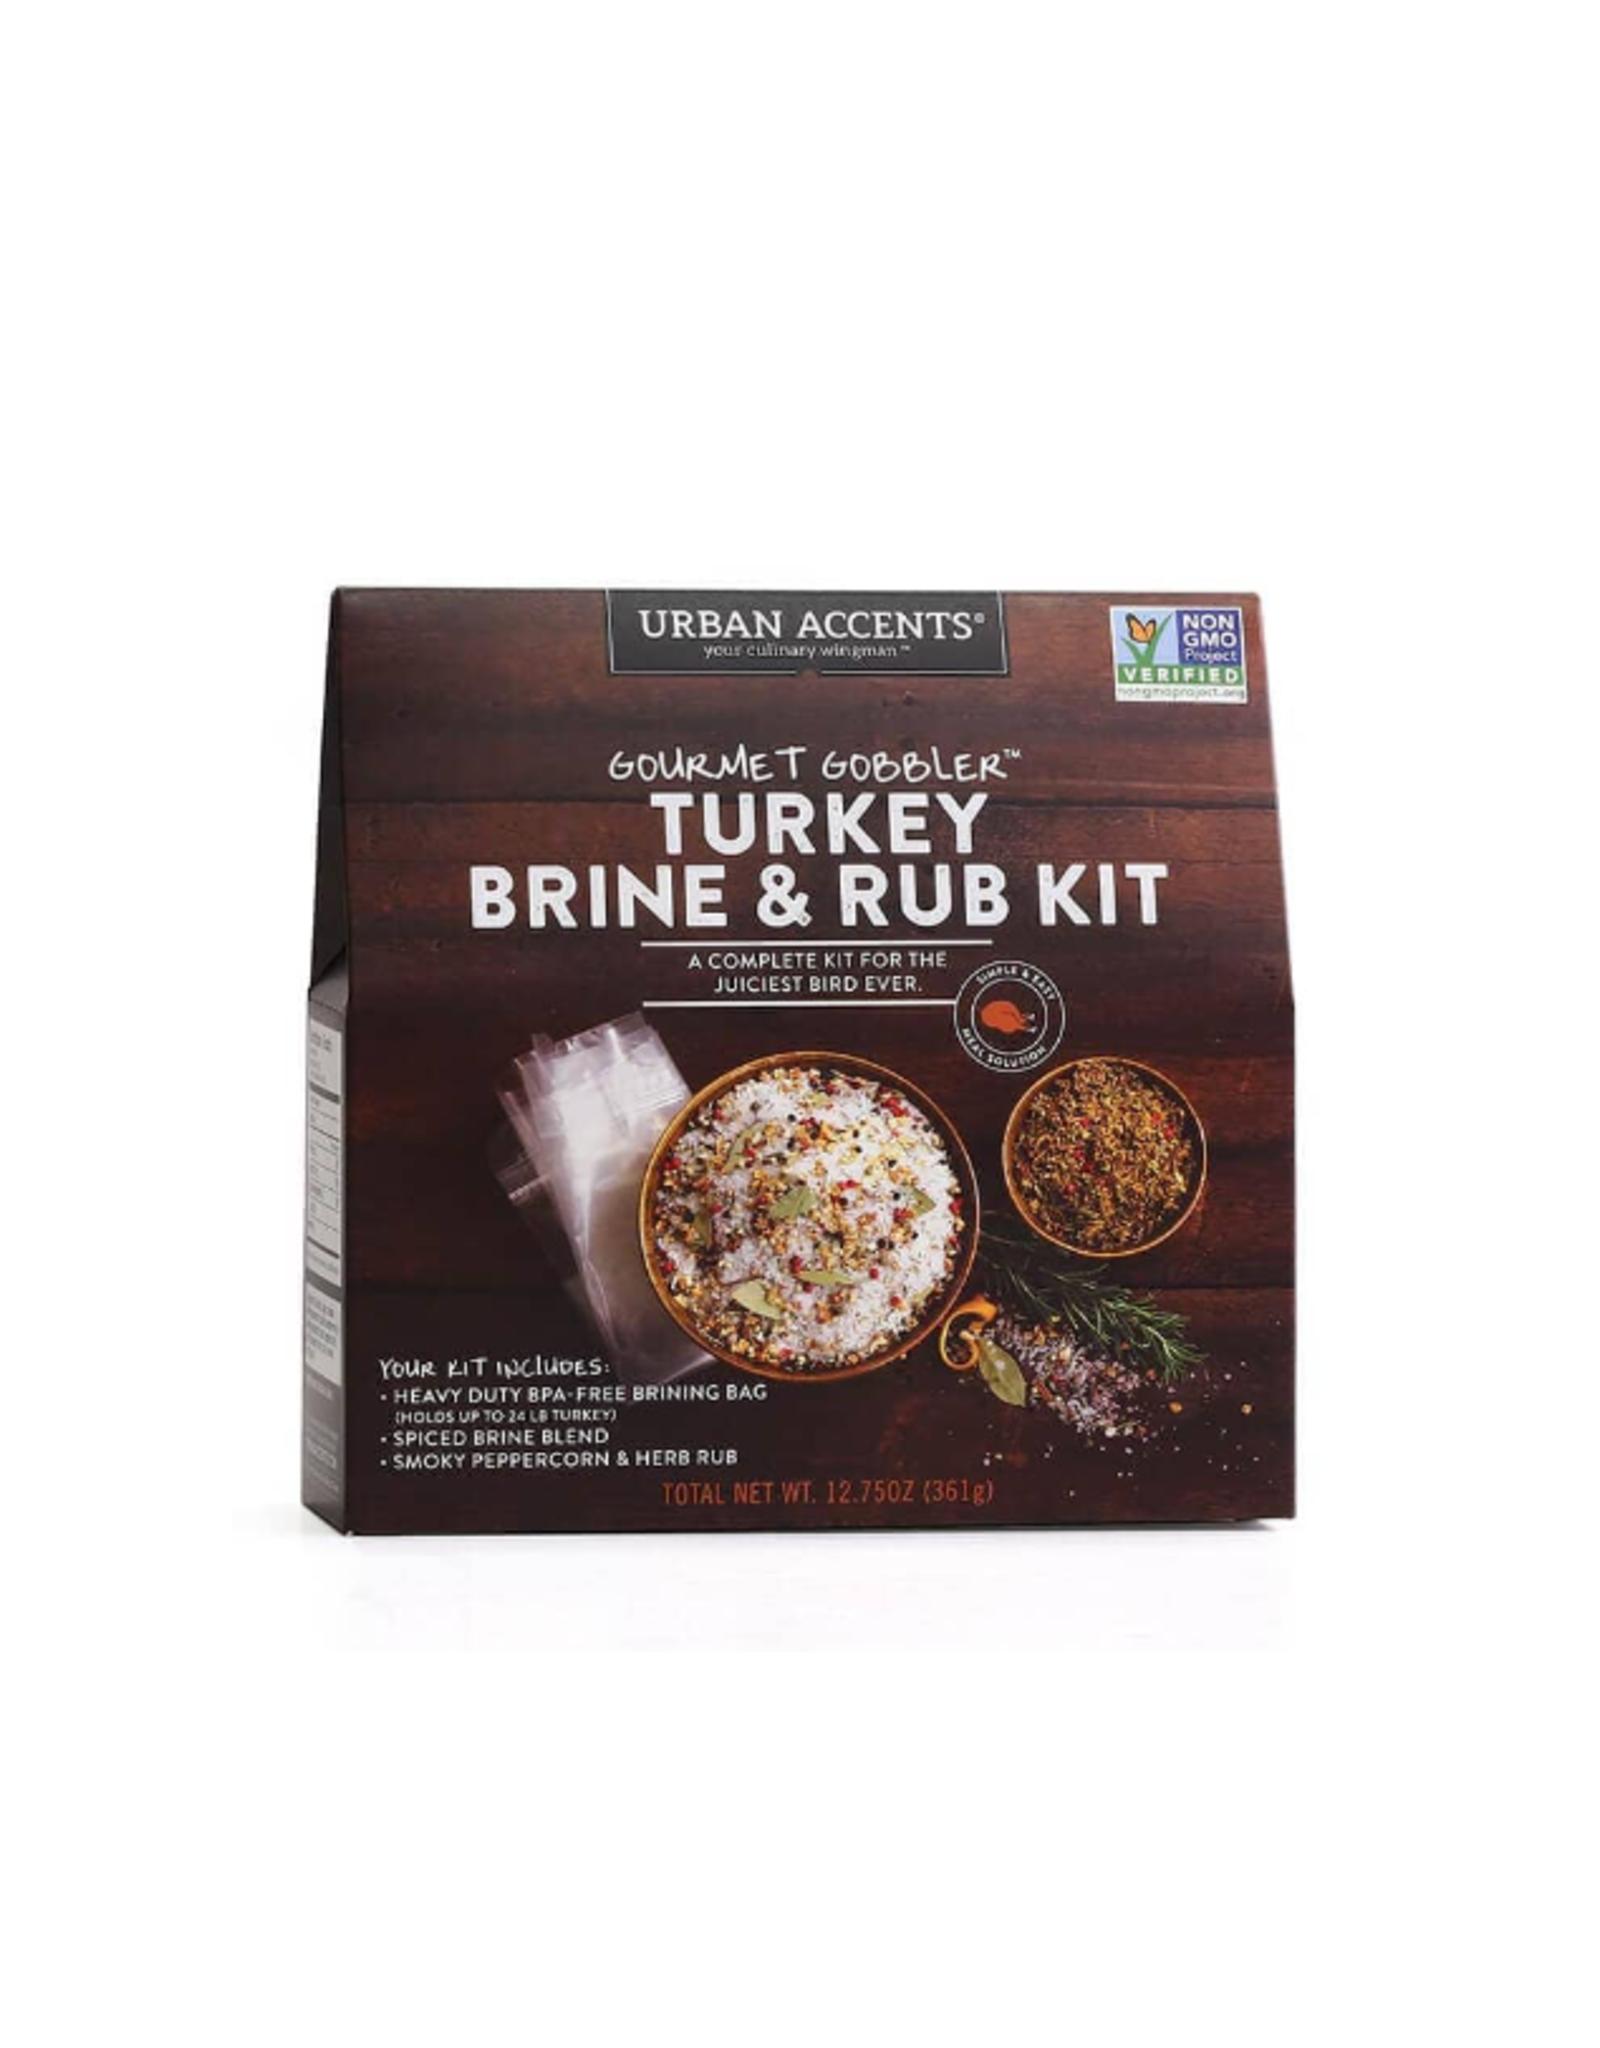 Urban Accents Gourmet Gobbler Brine Kit